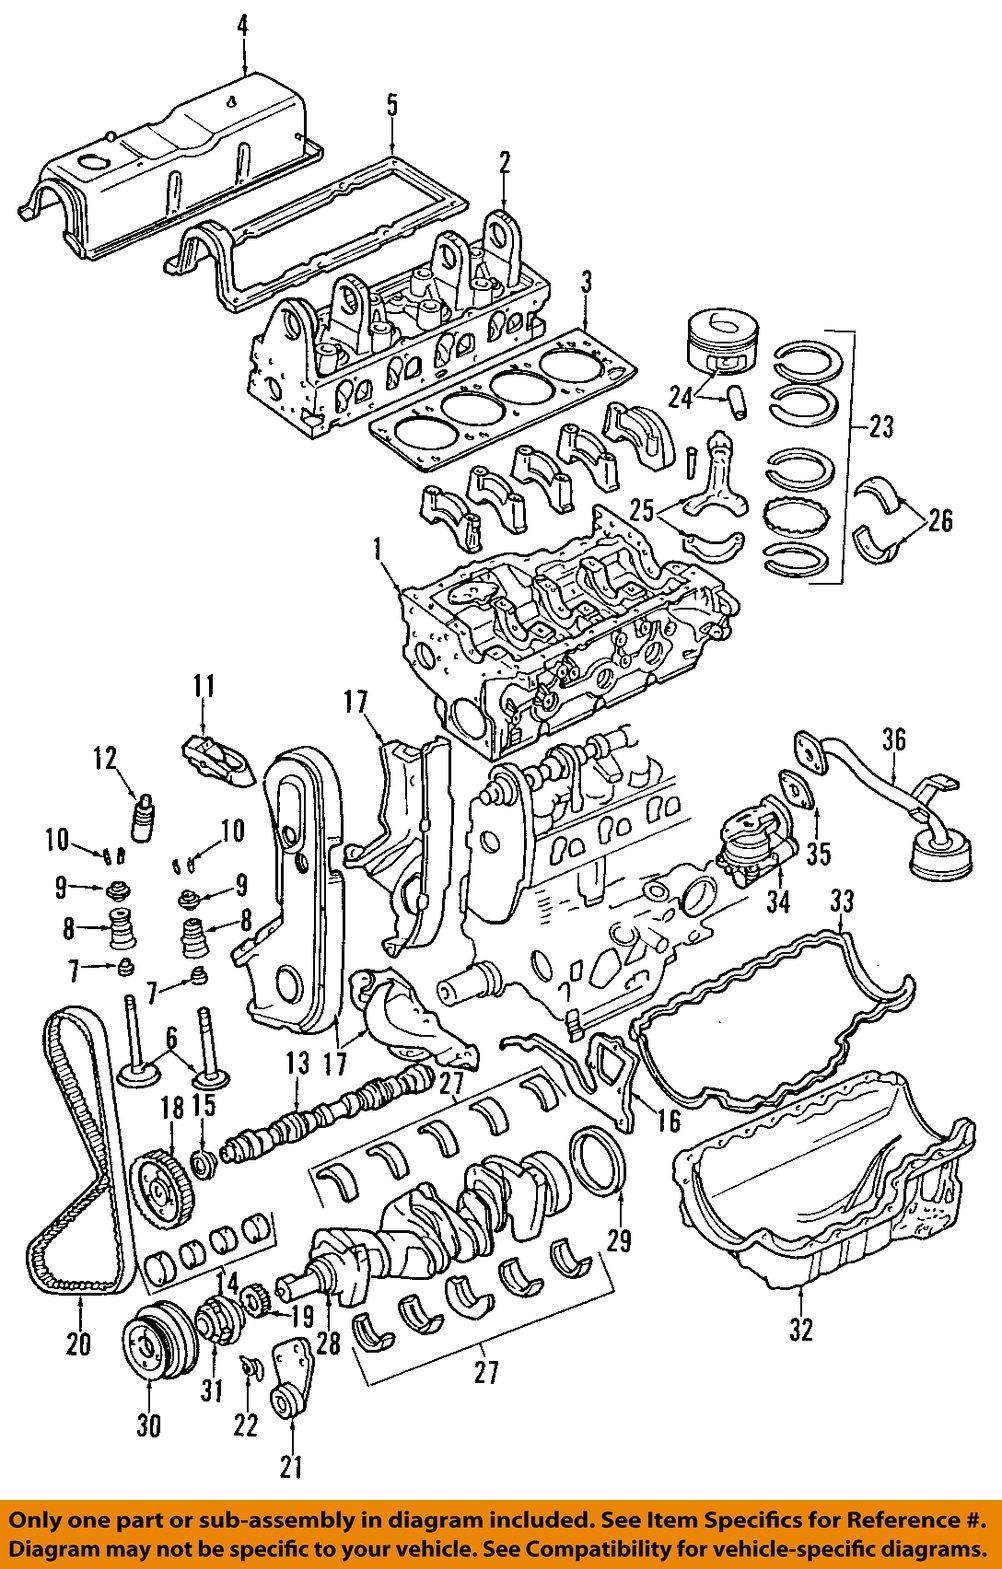 mazda oem 98 01 b2500 engine connecting rod bearing zzp011225 ebay rh ebay com 2001 mazda b2500 engine diagram mazda b2500 engine diagram